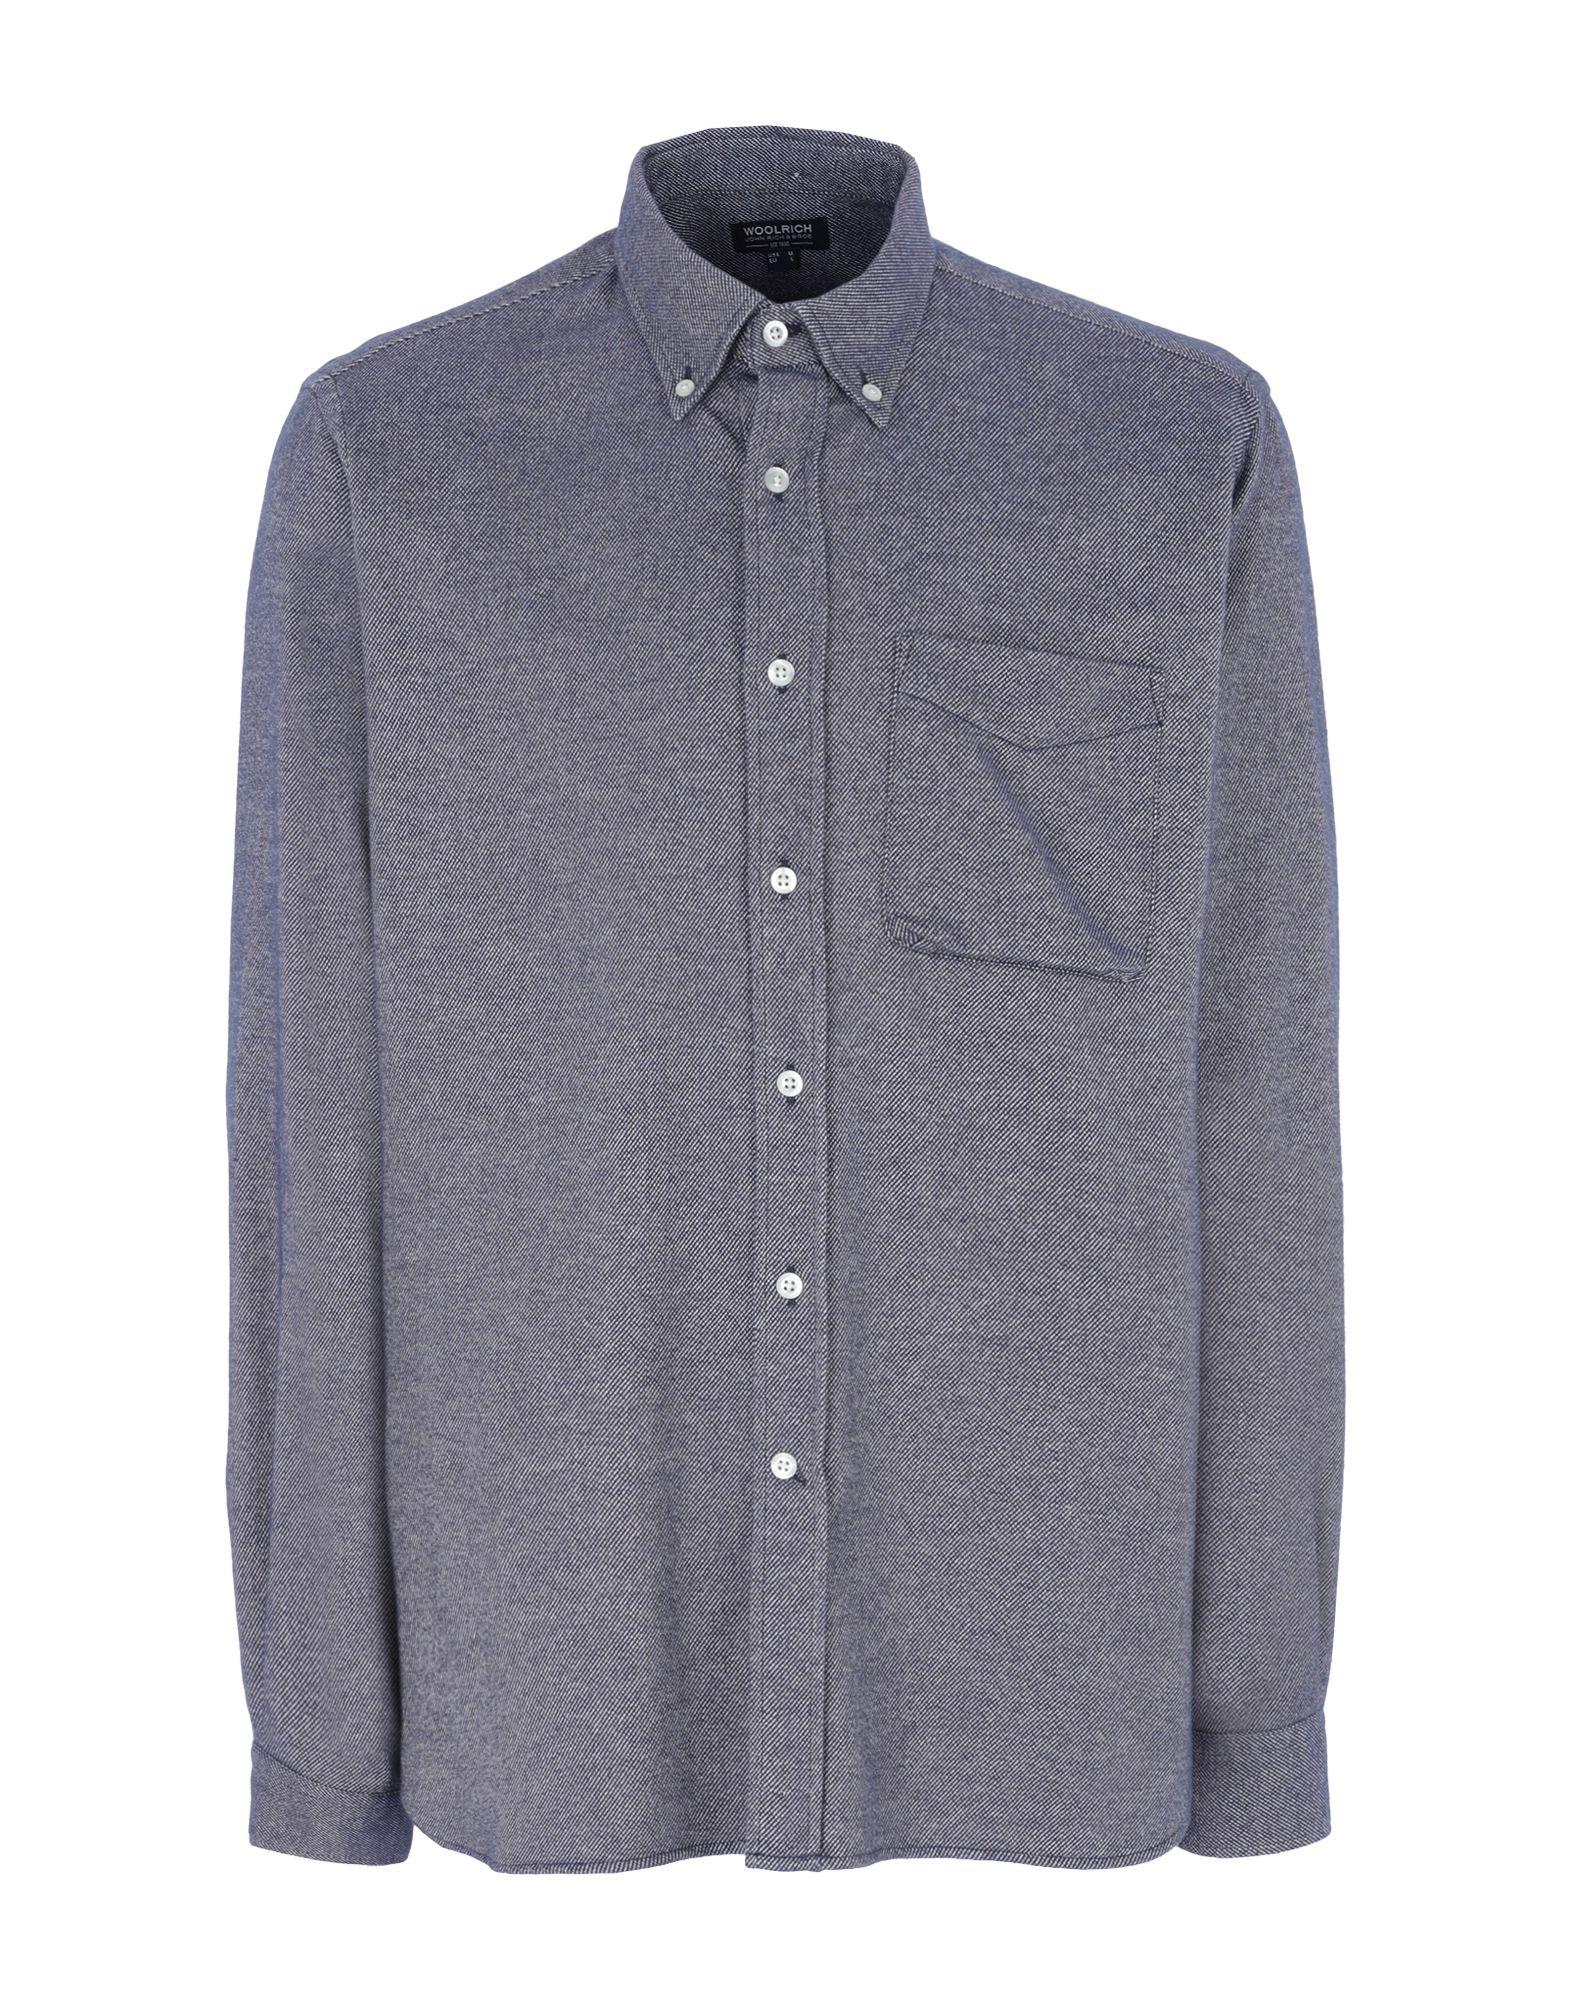 Camicia Fantasia Woolrich Woolrich uomo - 38858979LS